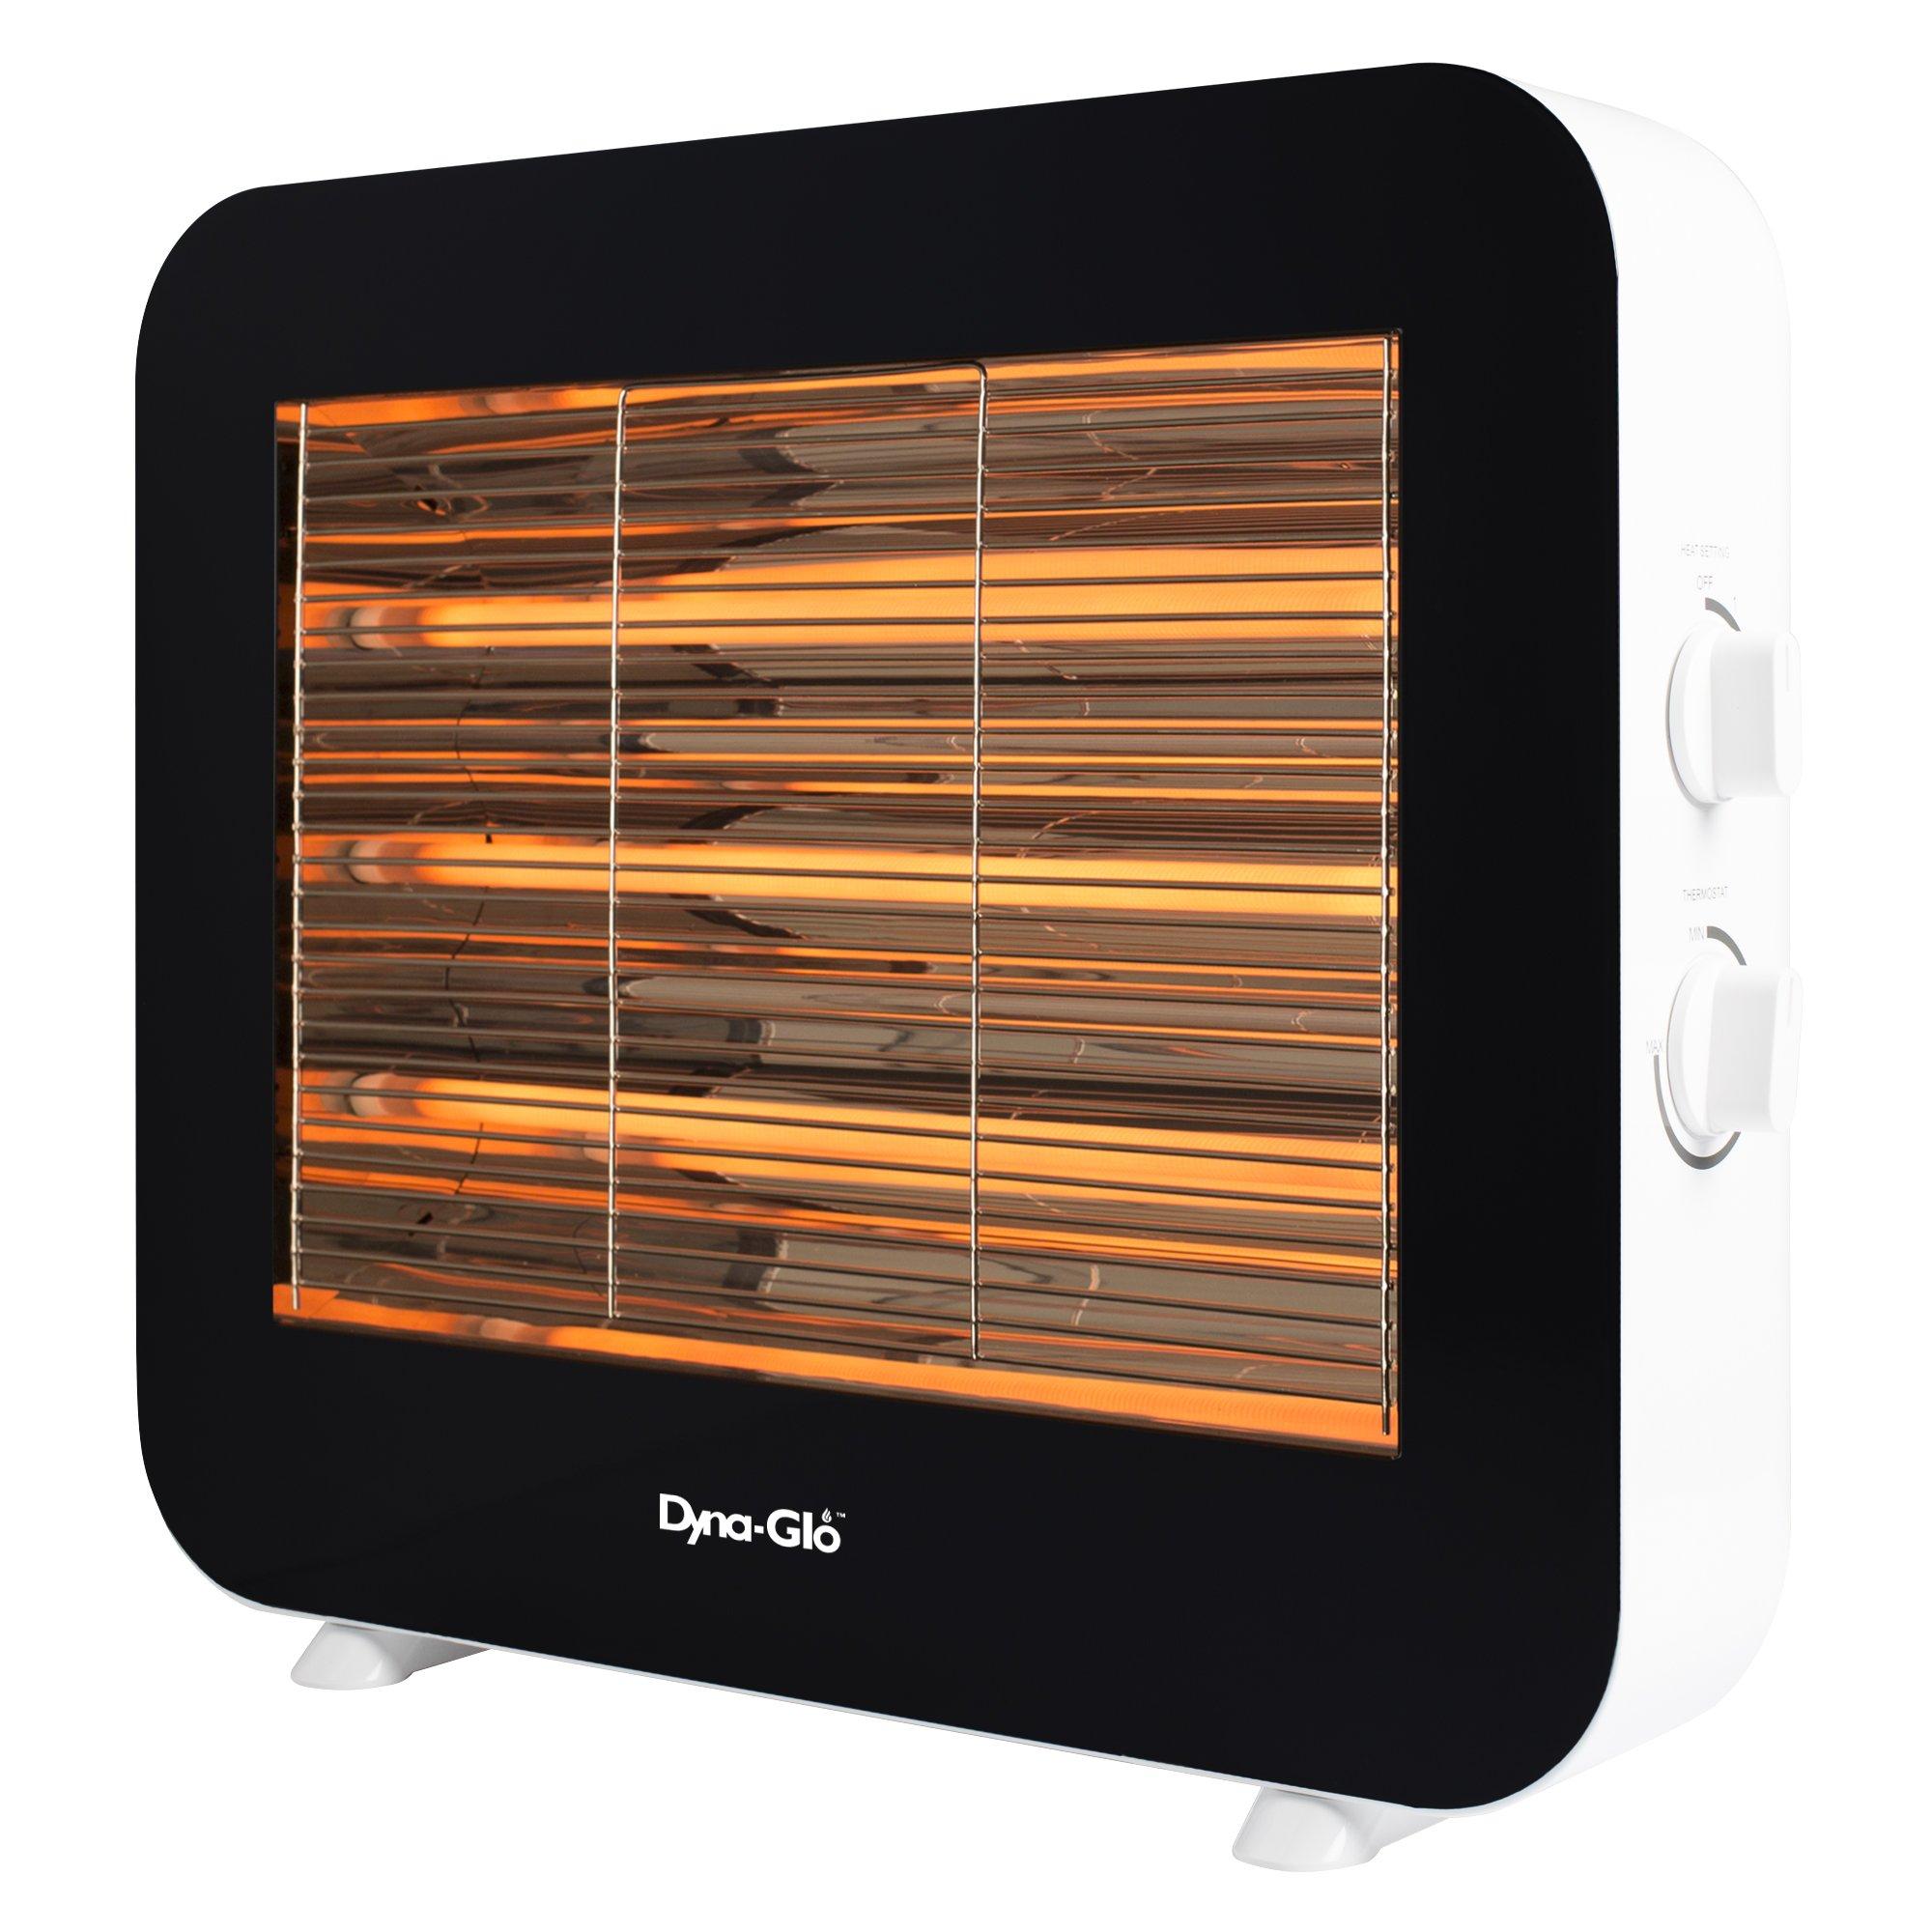 Dyna-Glo 1500 Watt Infrared Electric Quartz Radiant Heater